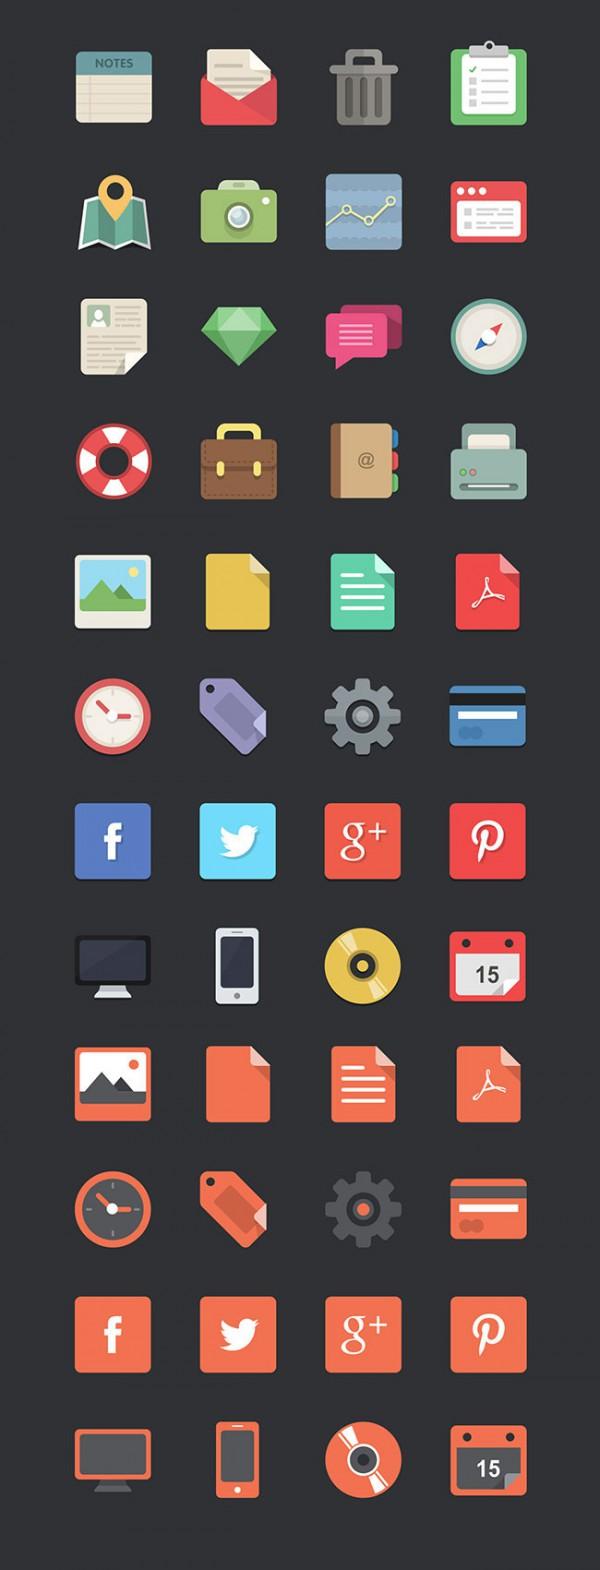 04 48 Flat Design Icons Set